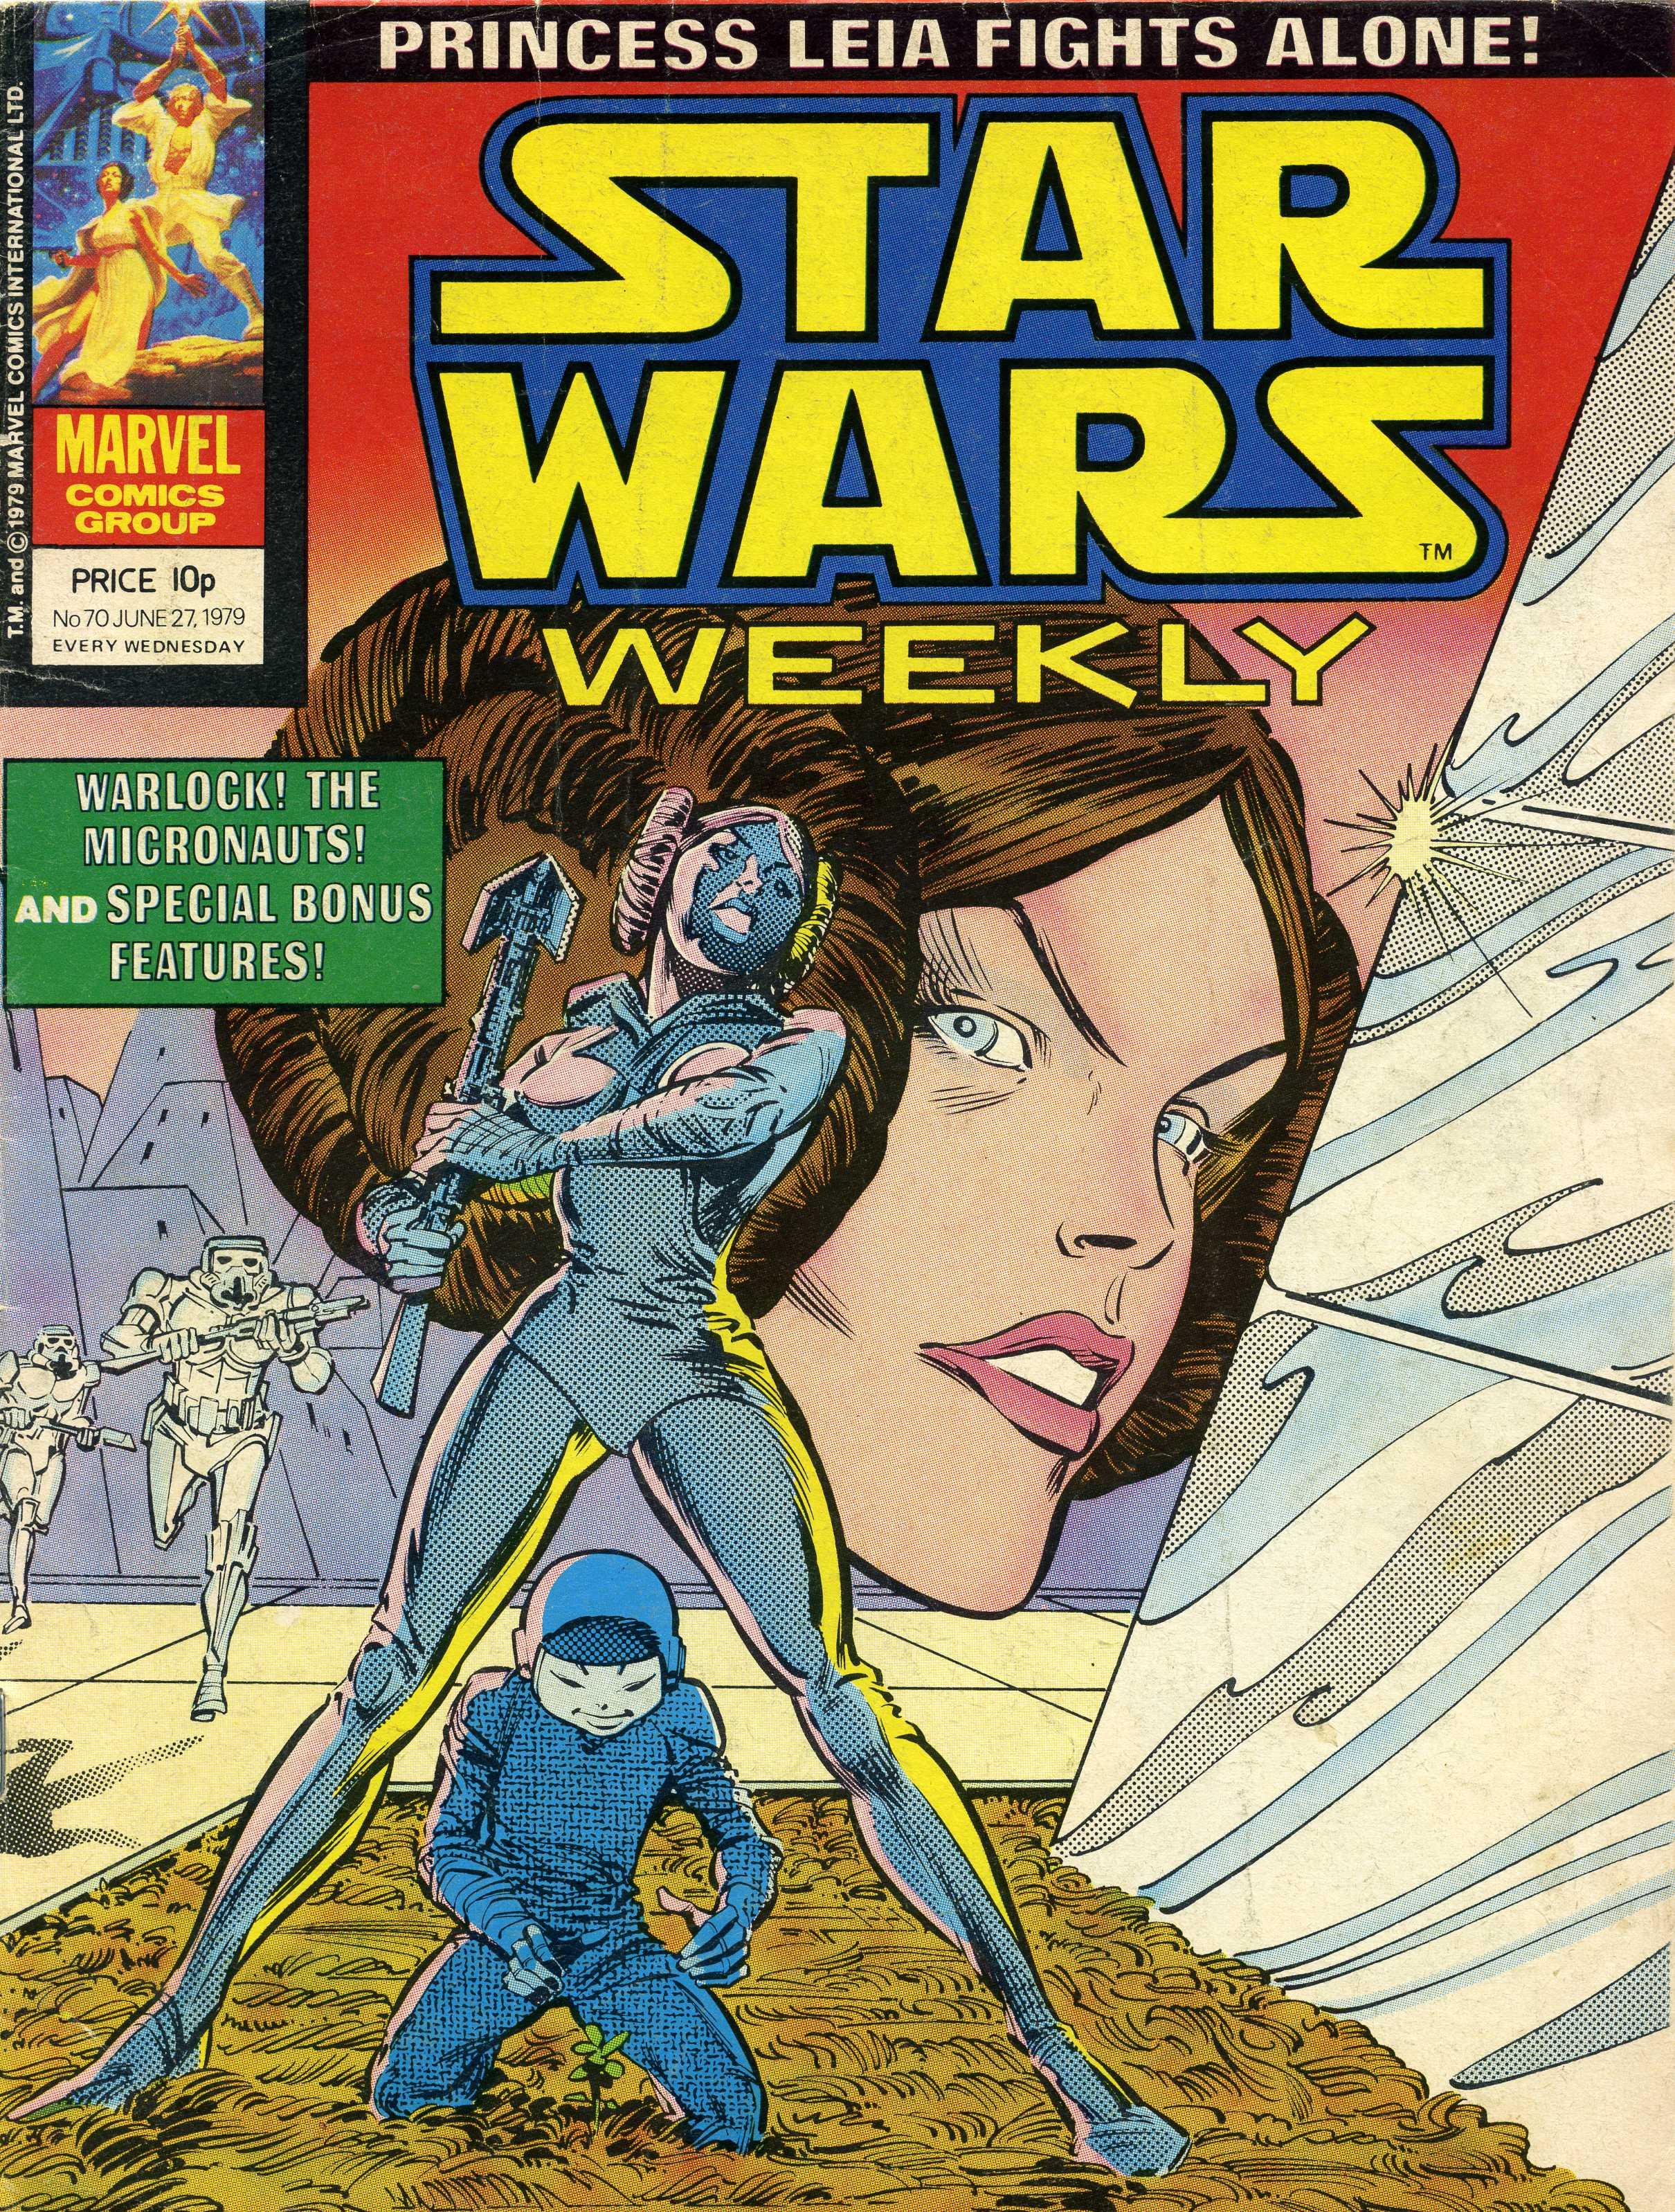 Star Wars Weekly 70